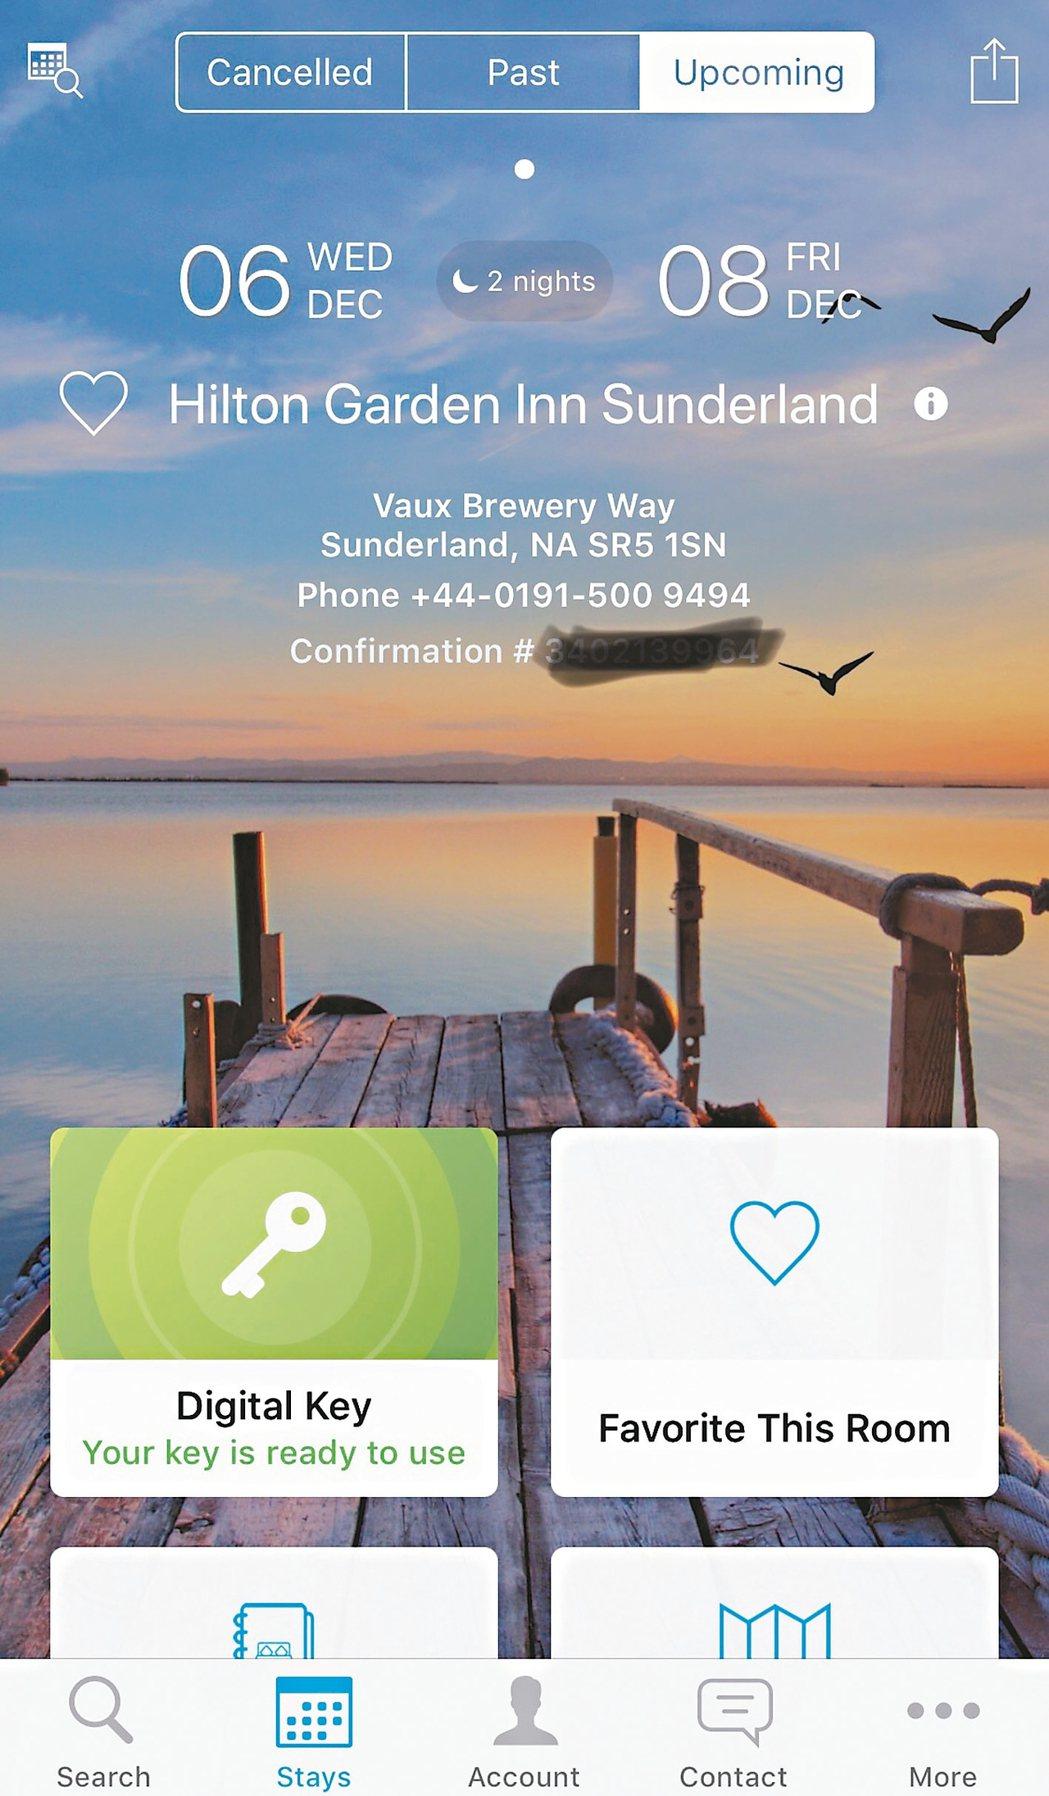 希爾頓酒店集團(Hilton)宣布2018年推出「Connected Room」...